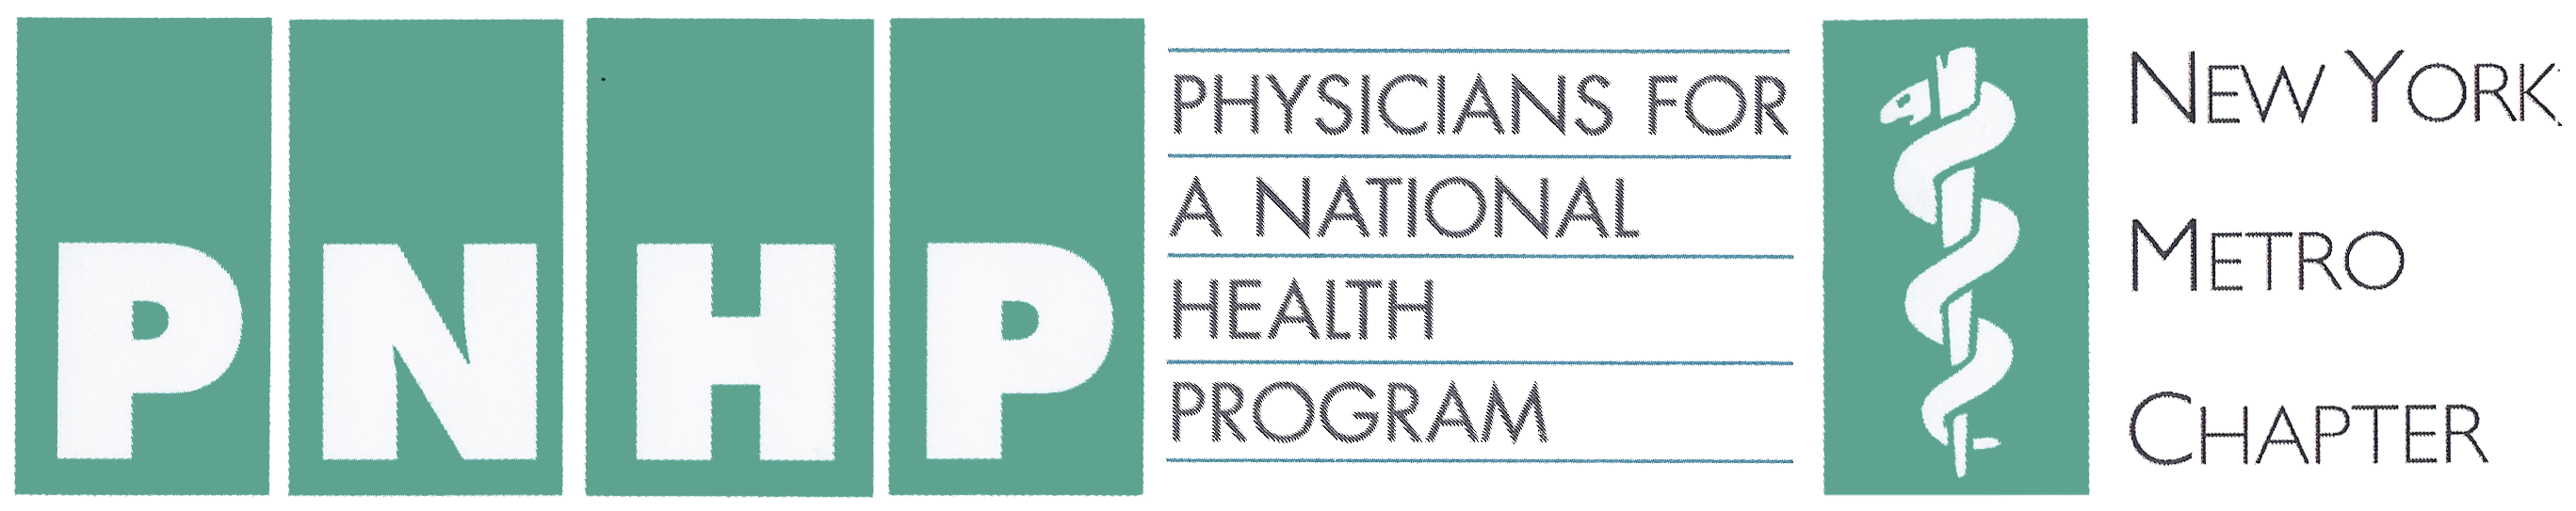 PNHP_Logo_2019.png